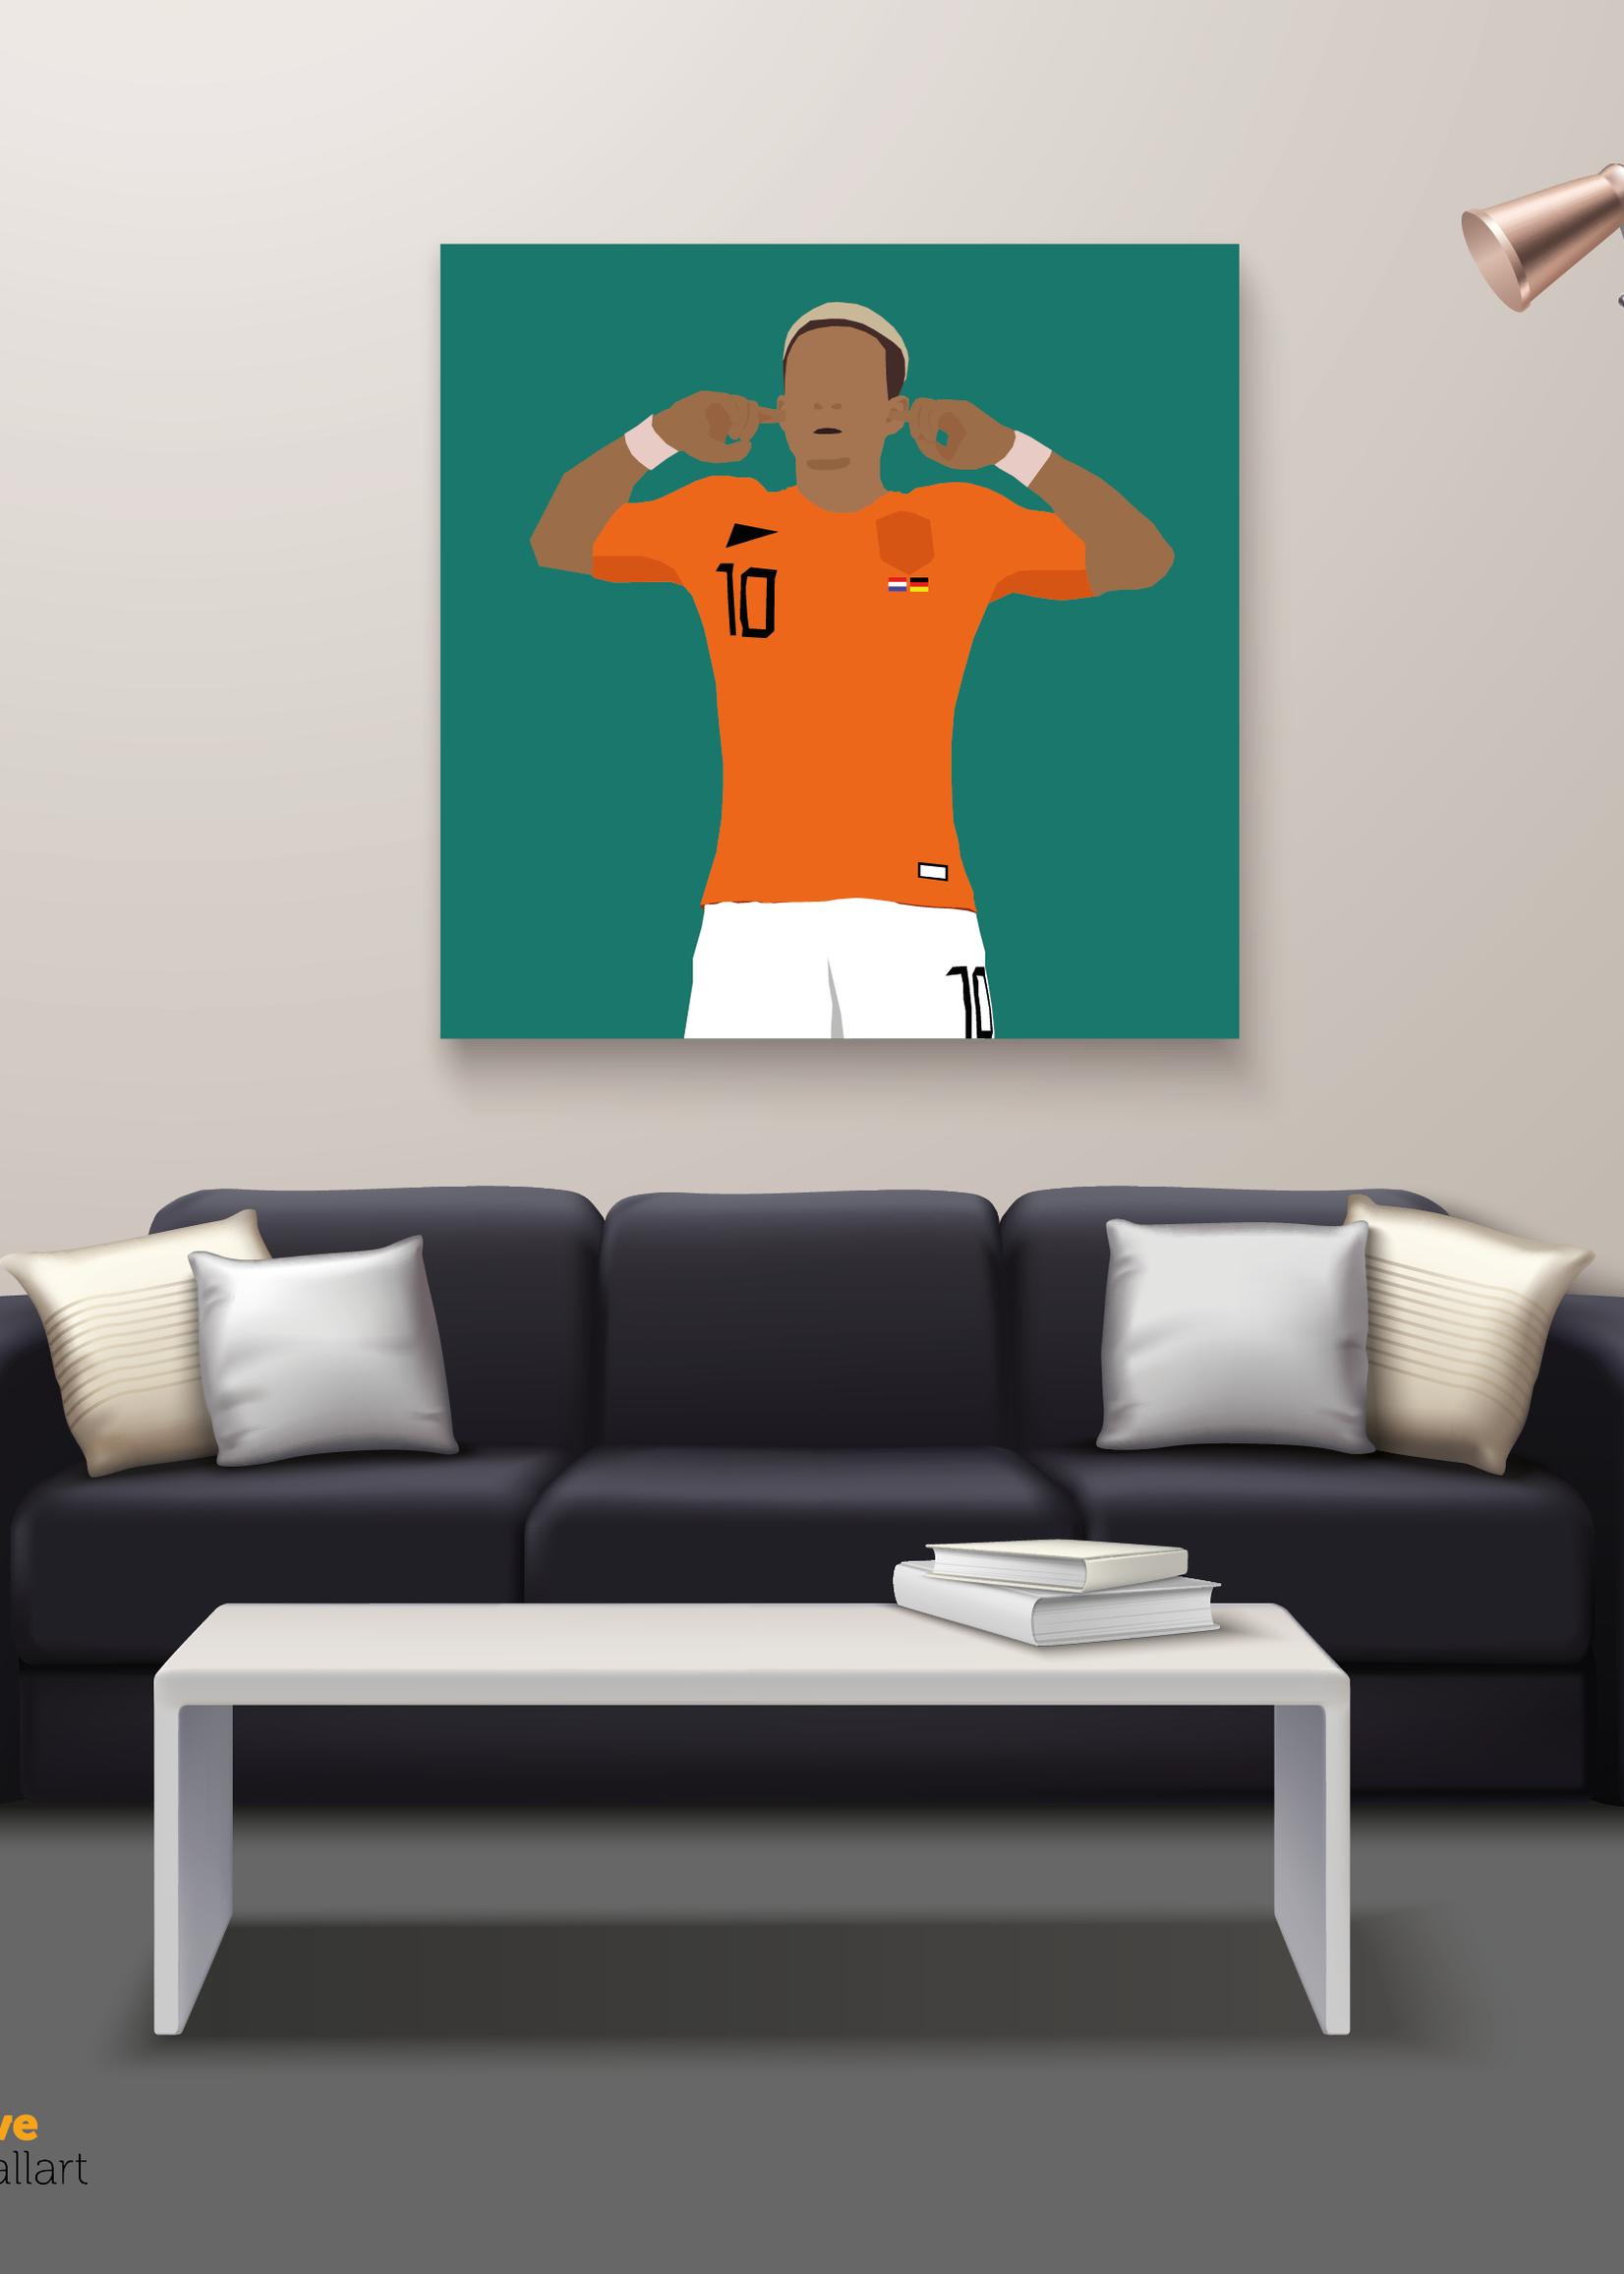 "We Love Football Art ""Träume, glaube, erreiche"" We Love Football Art"